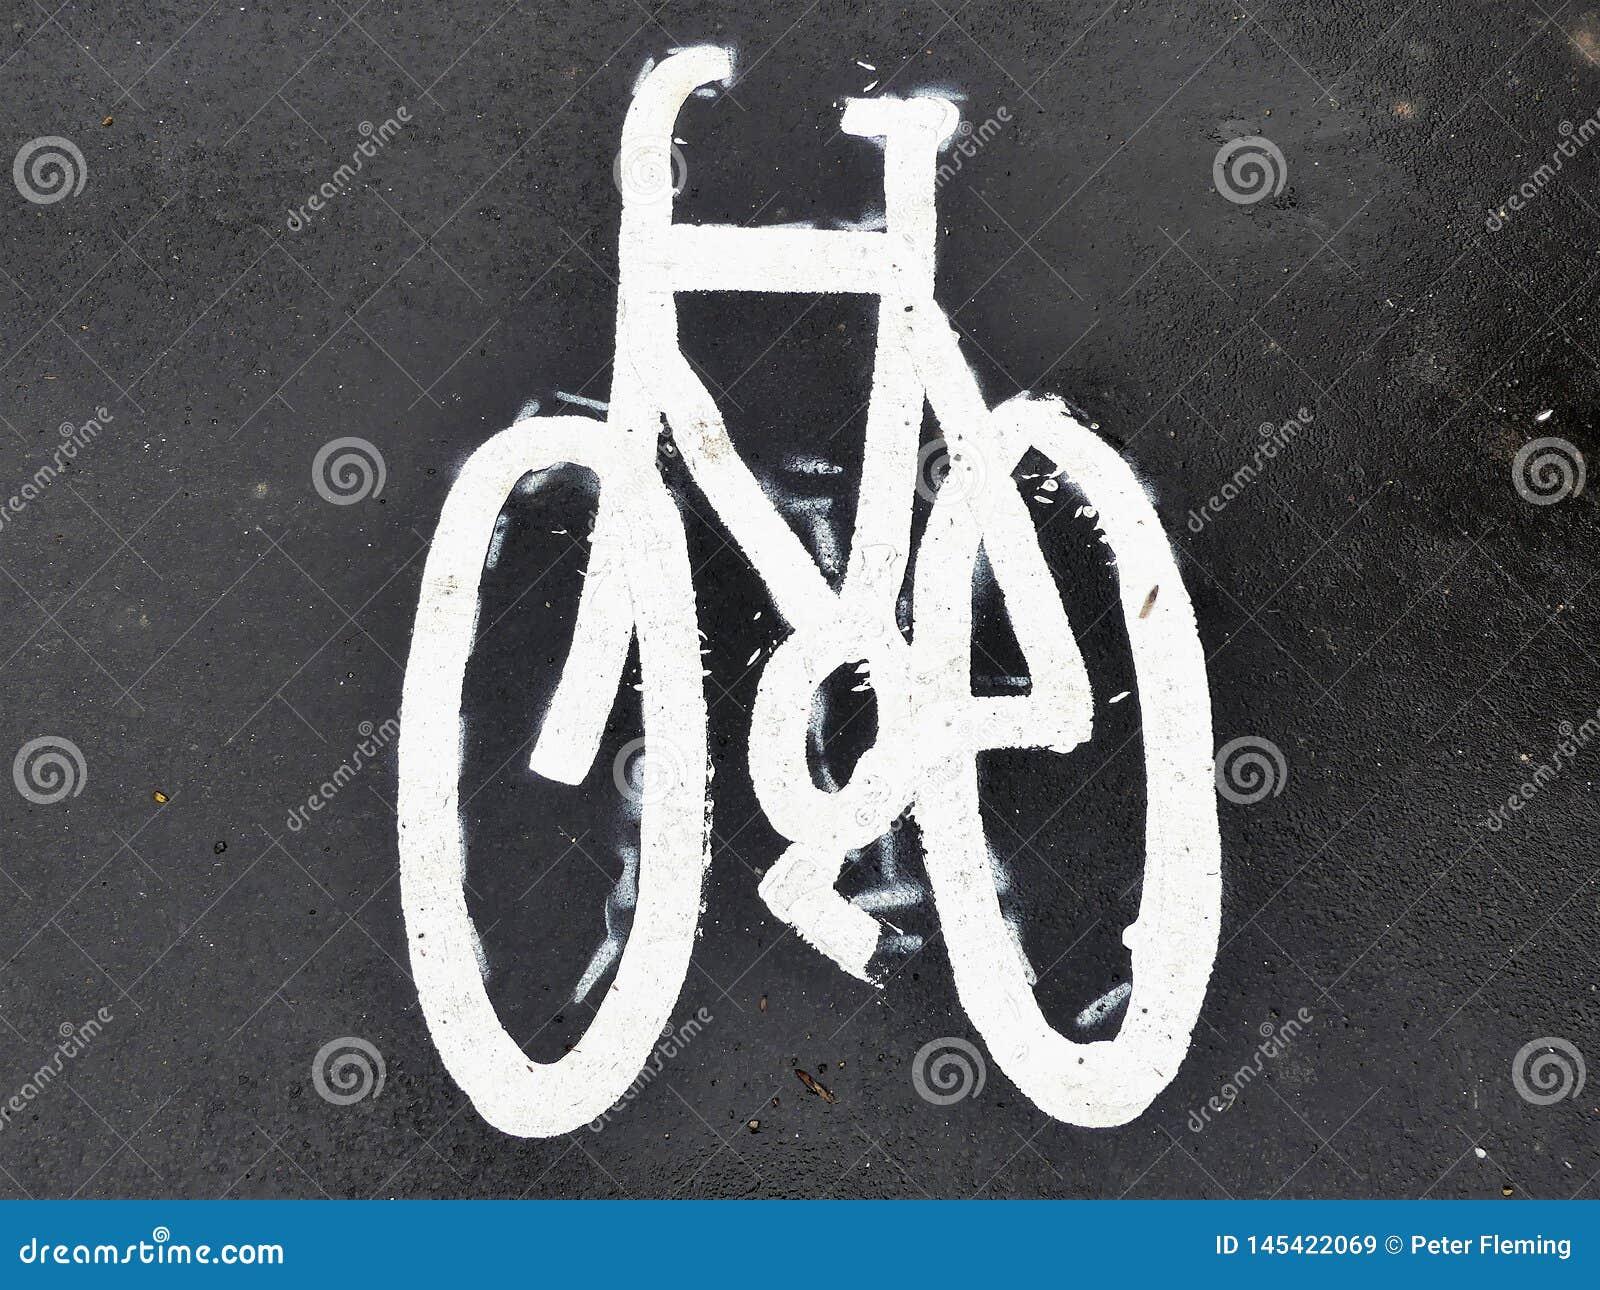 Målat cykeltecken på asfalttrottoar